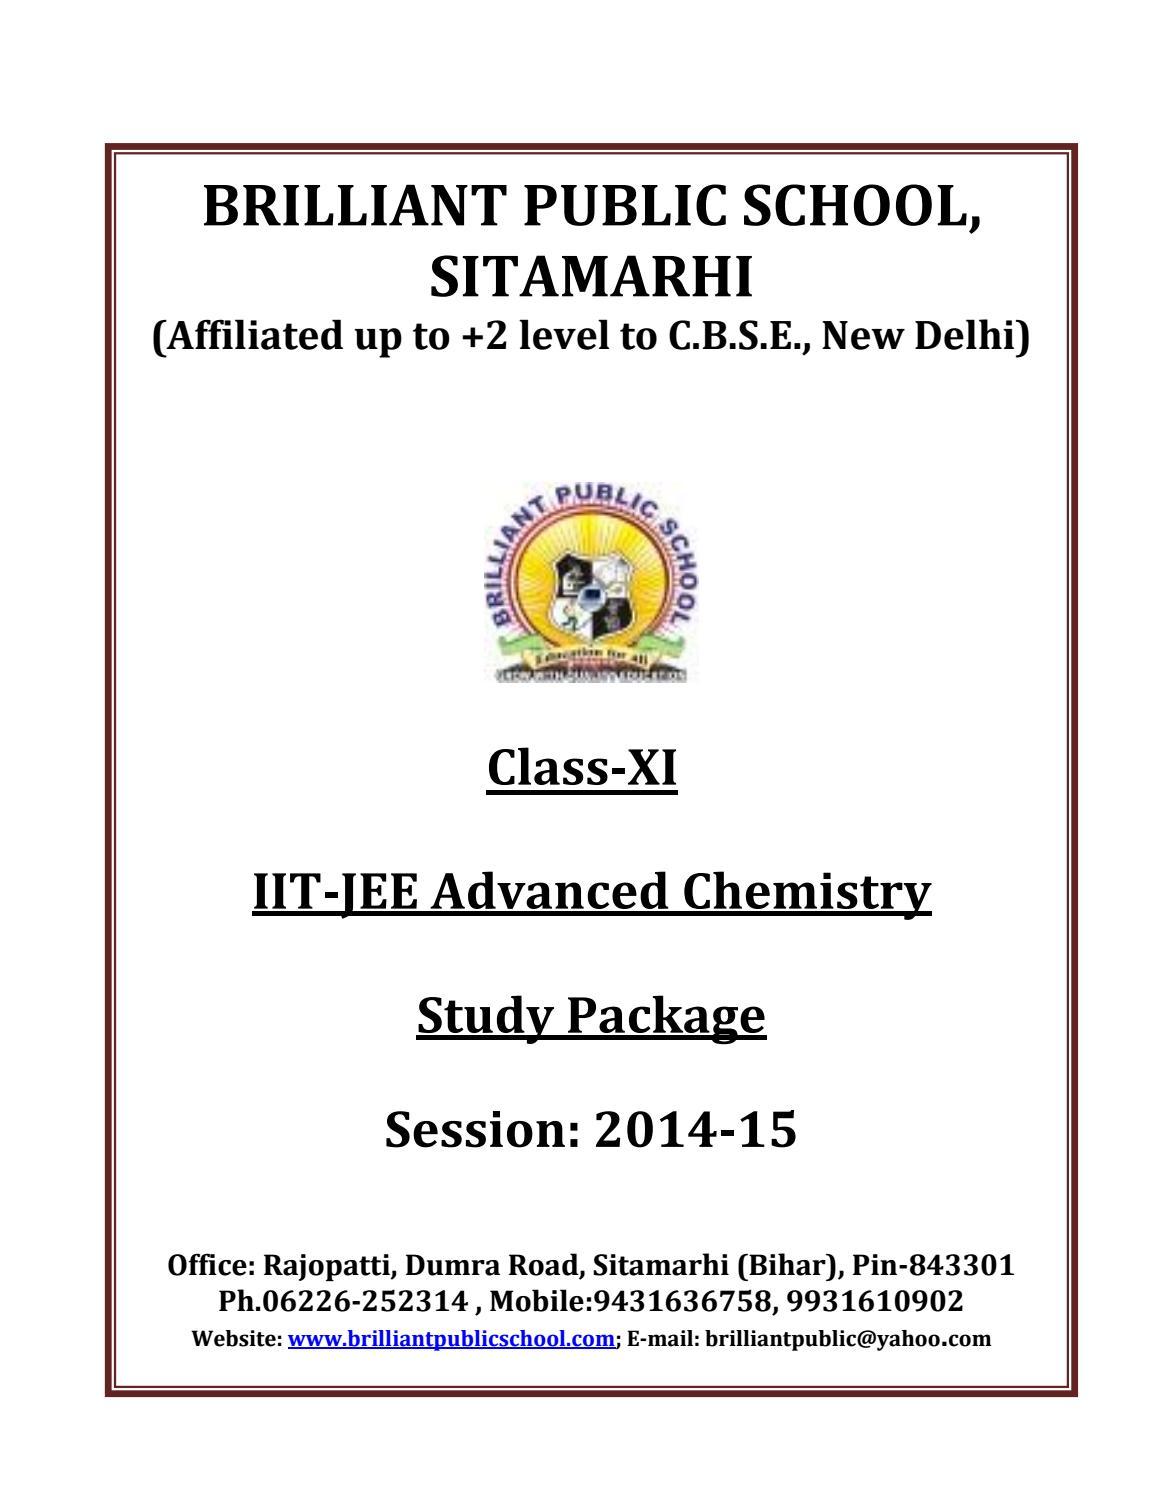 Doc 117 B P S Xi Chemistry Iit Jee Advanced Study Package